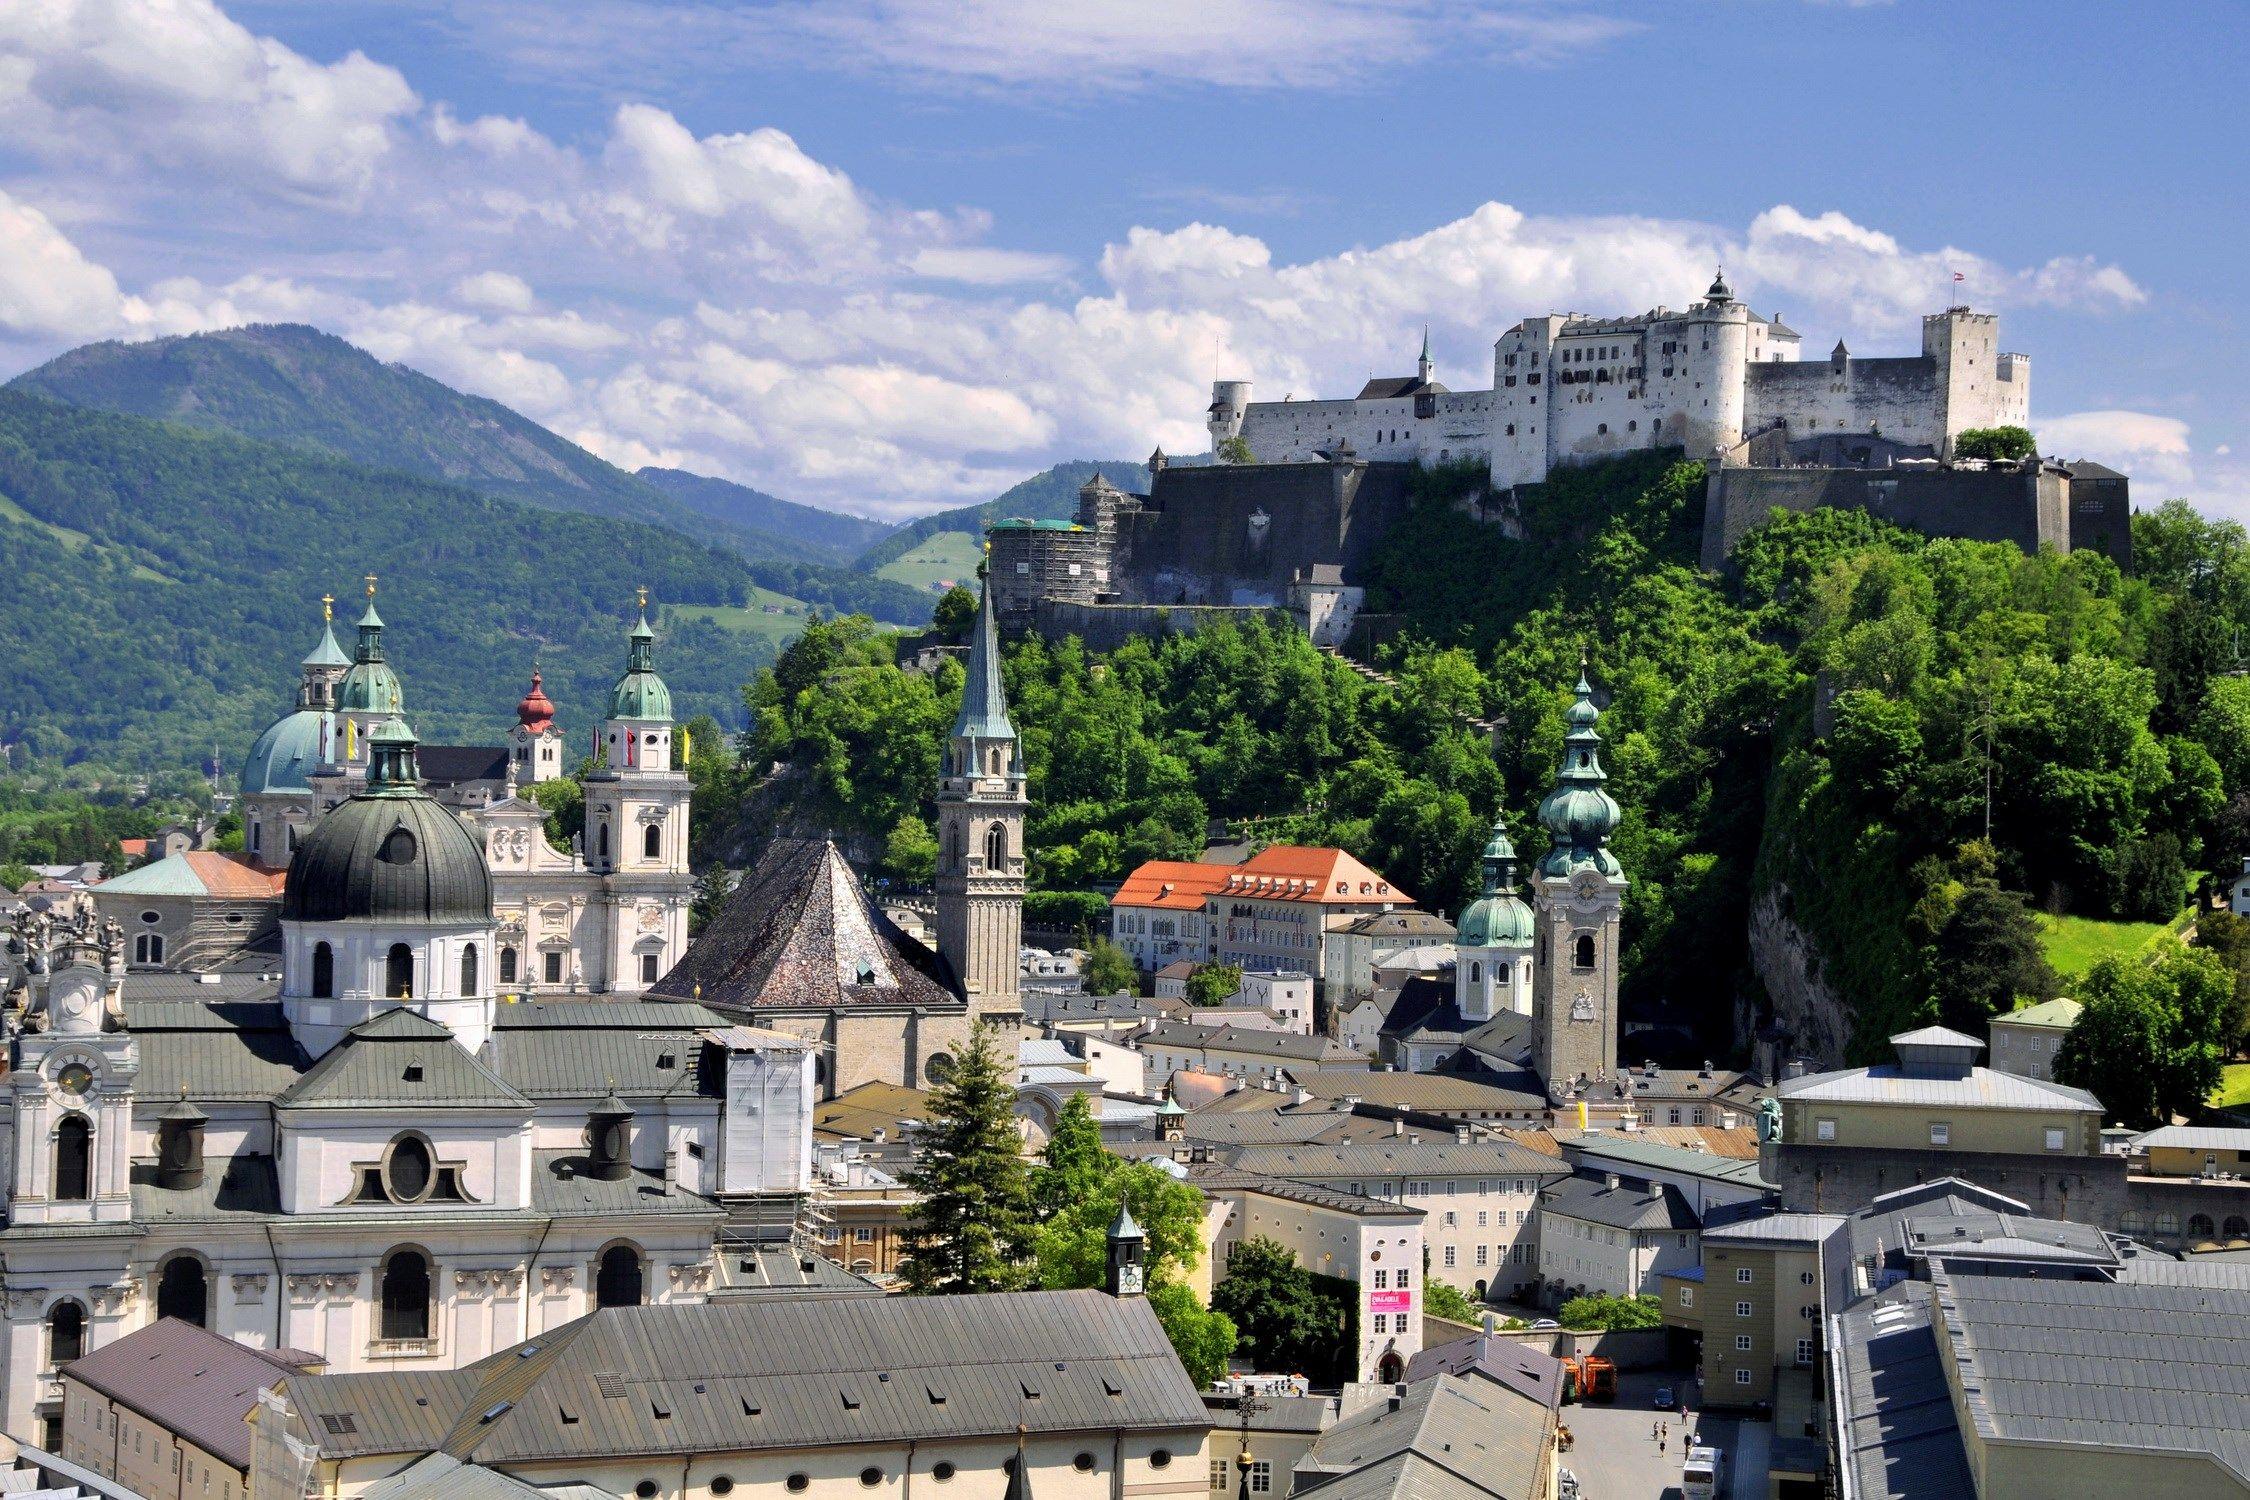 Seefeld, Austria - I Love To Travel - Pinterest -